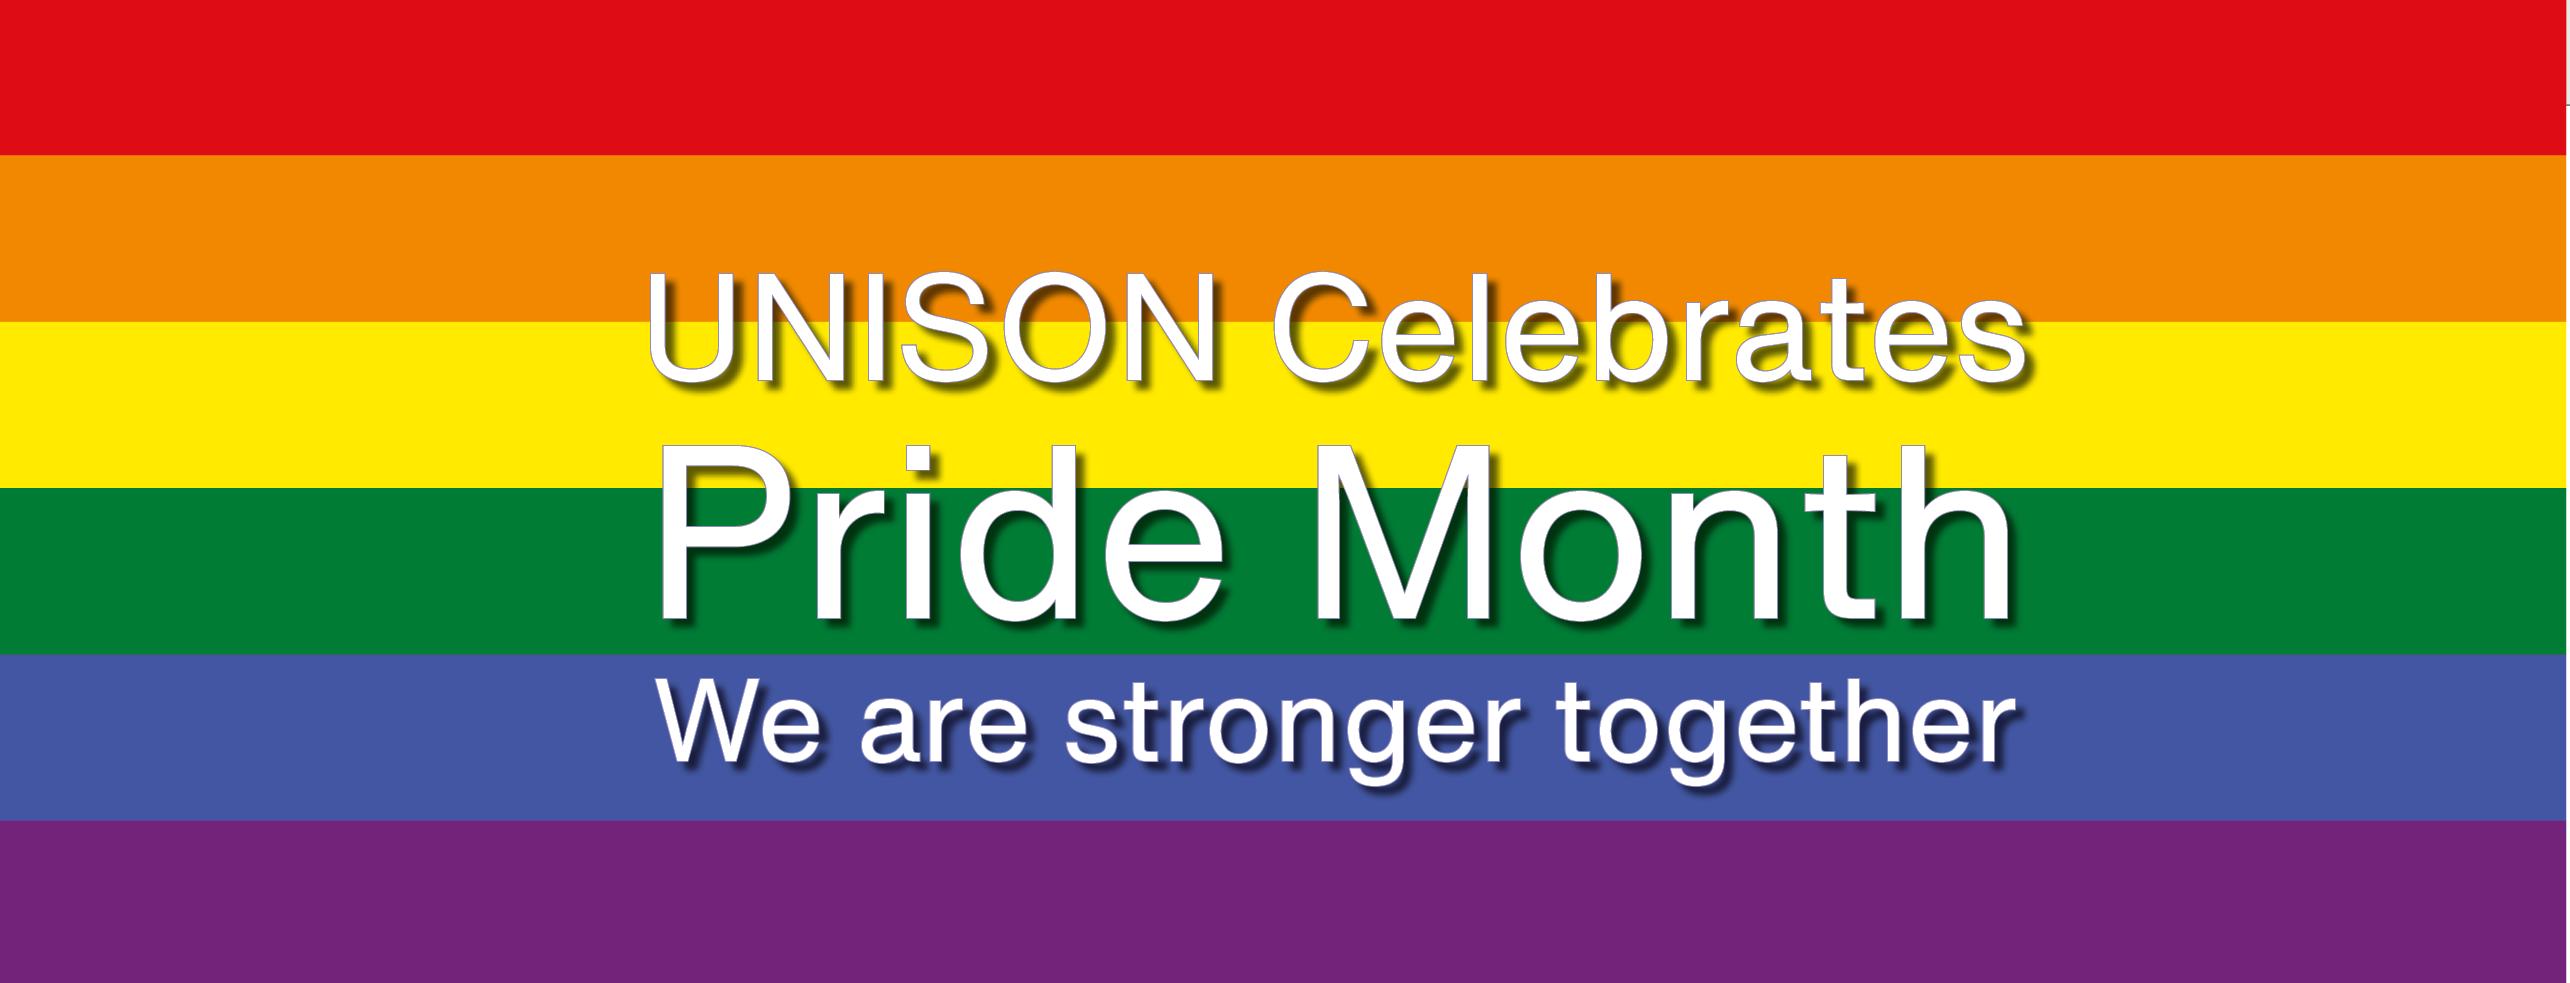 pride month slider